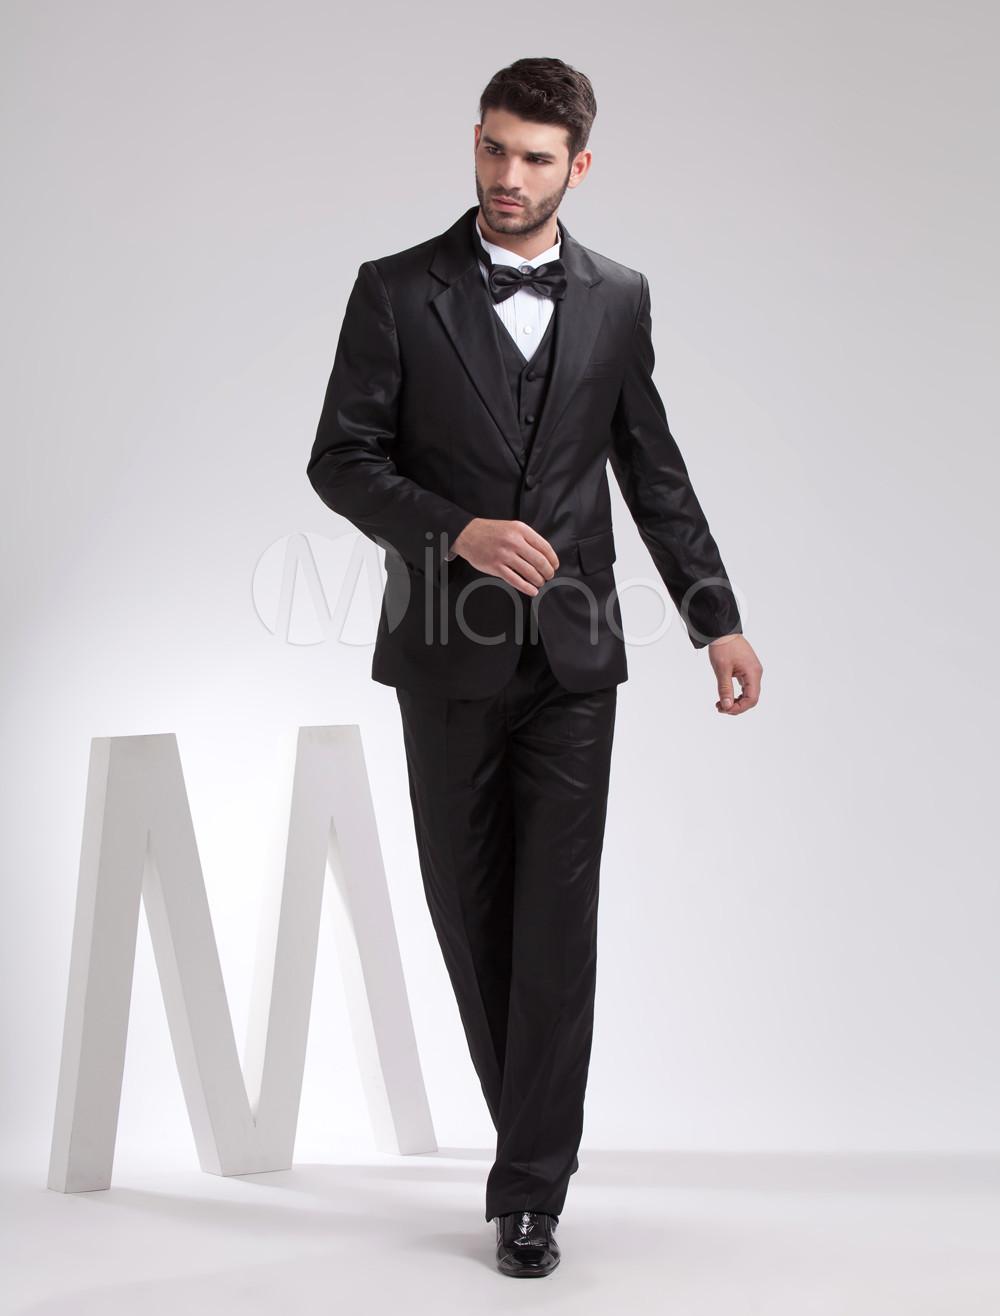 77db88b484bb9 ... 新郎スーツ,セット タキシード オーダーメイド可能 結婚式スーツ パーティー ゥェディング 高品質-. 12. 色  AddThis  Sharing Buttons